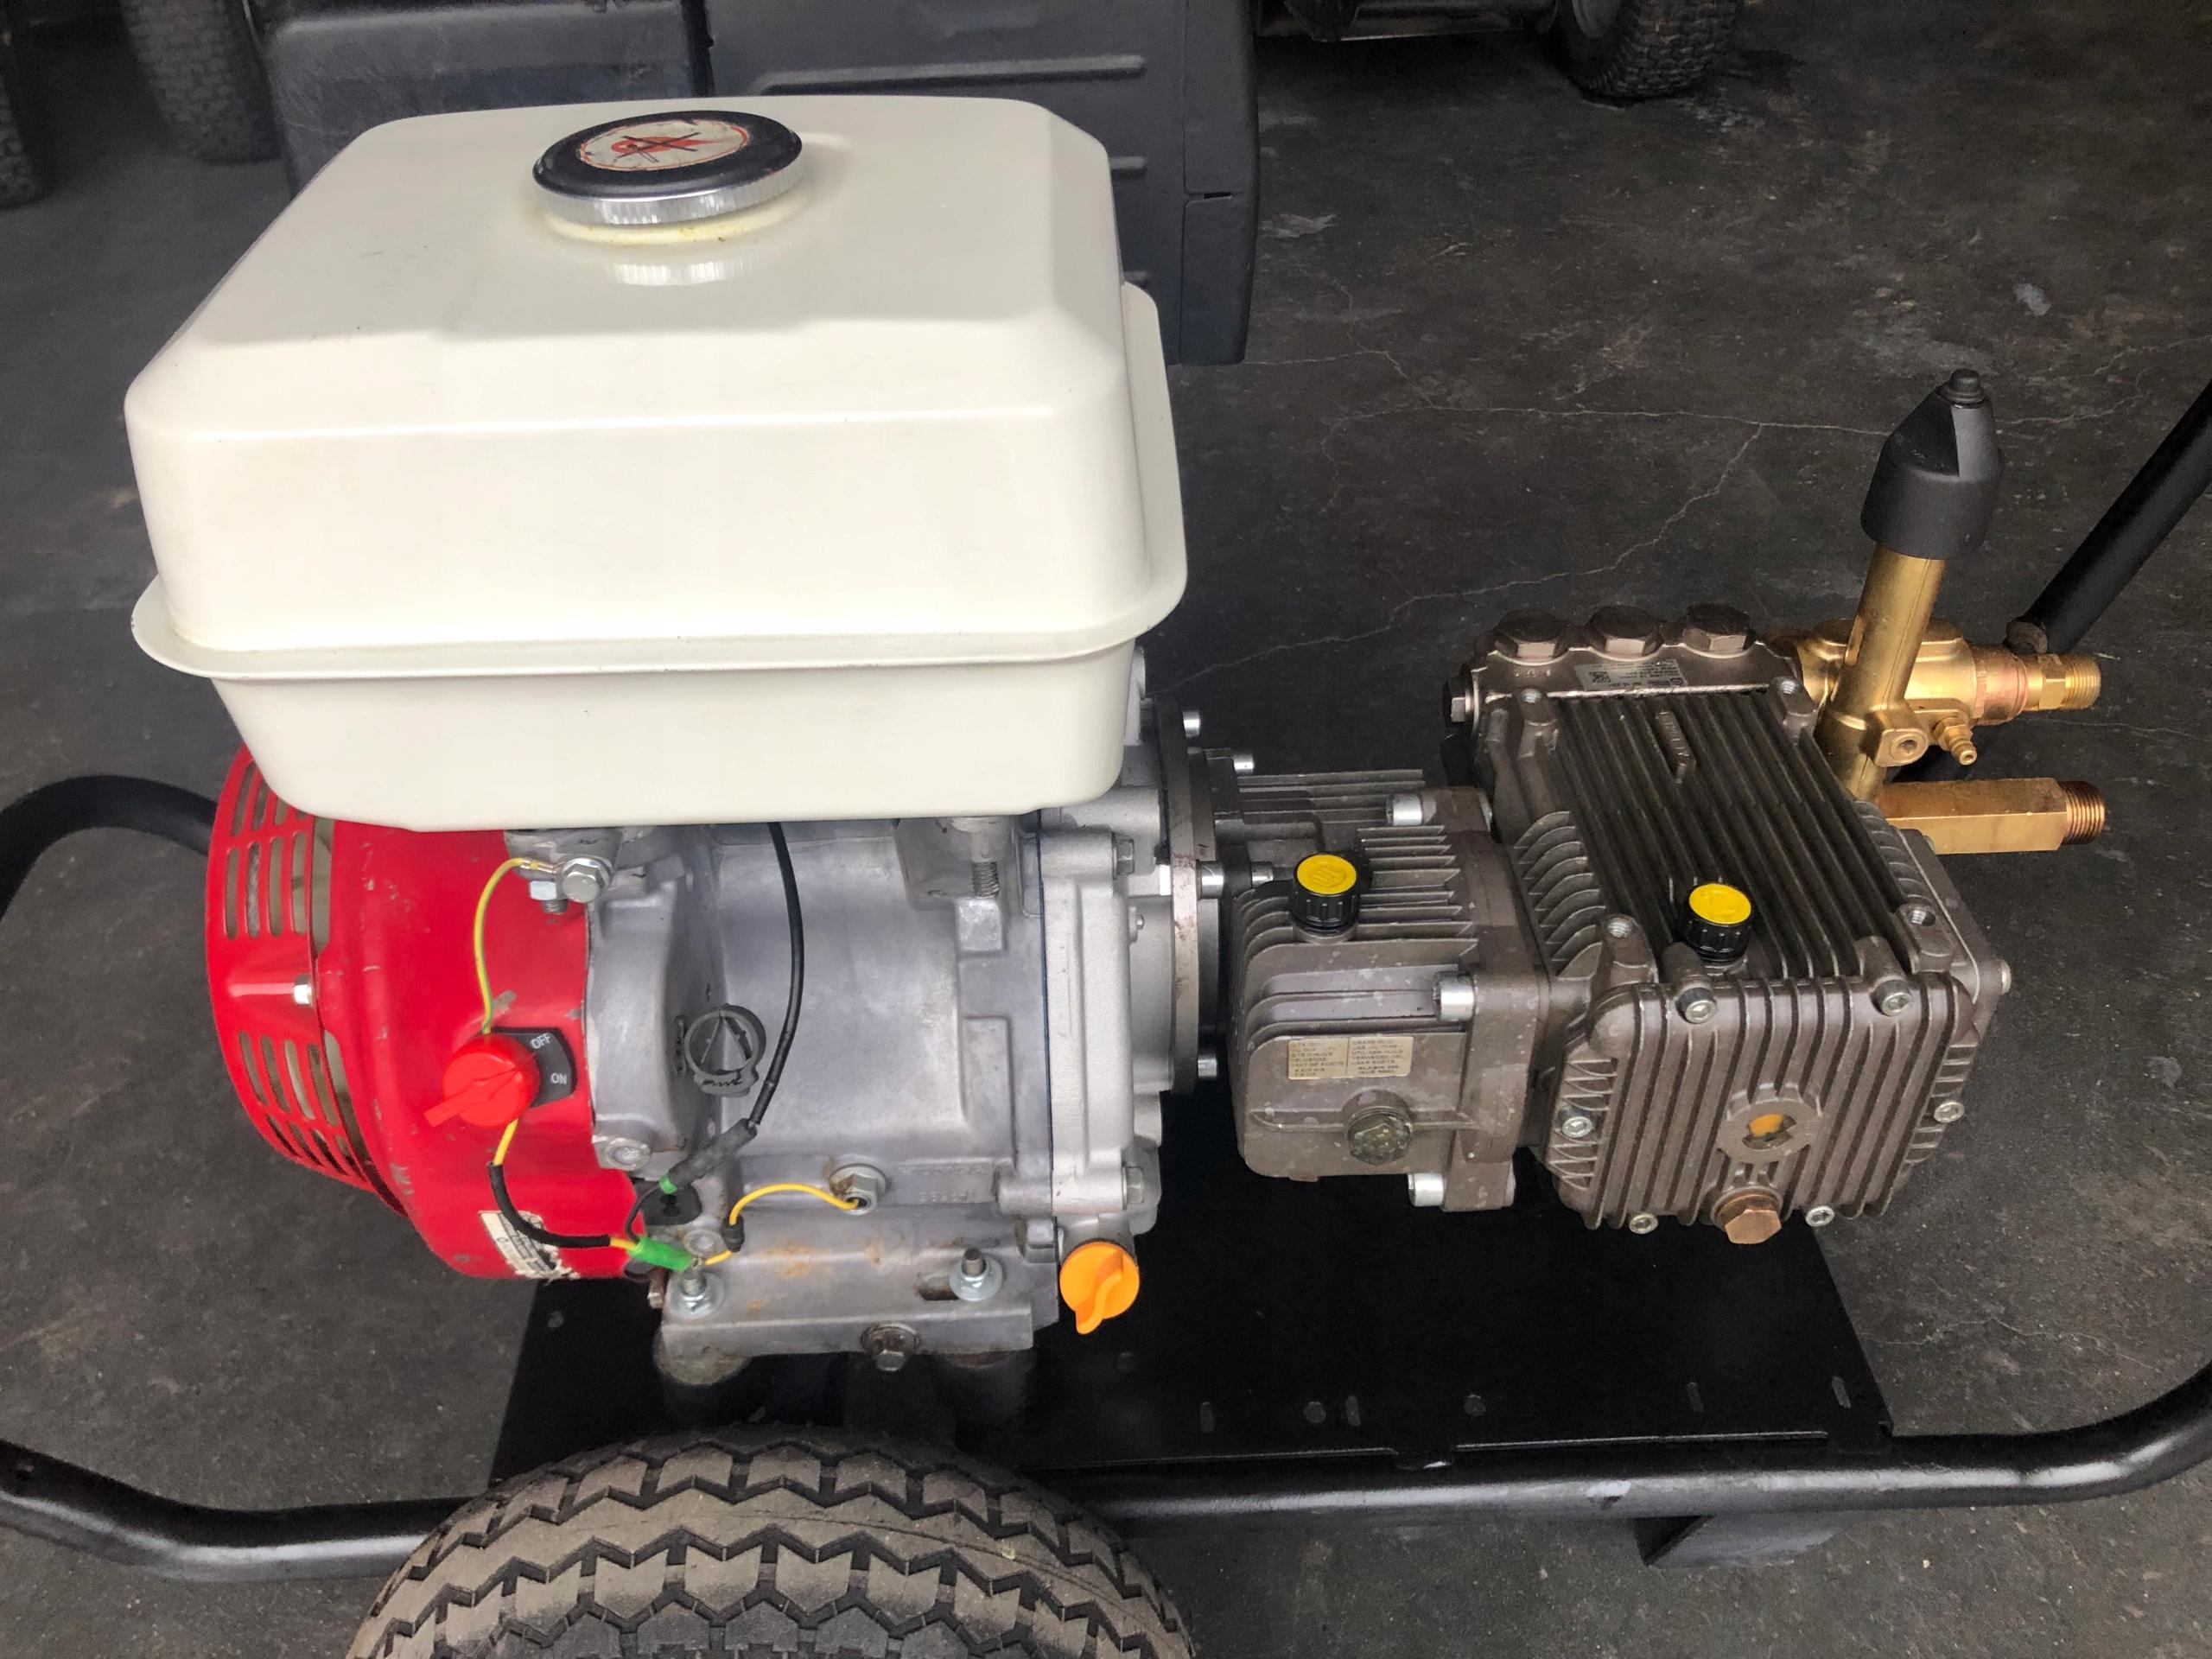 Бензиновый омыватель Nilfisk Honda GX390 чистая 5000 злотых.